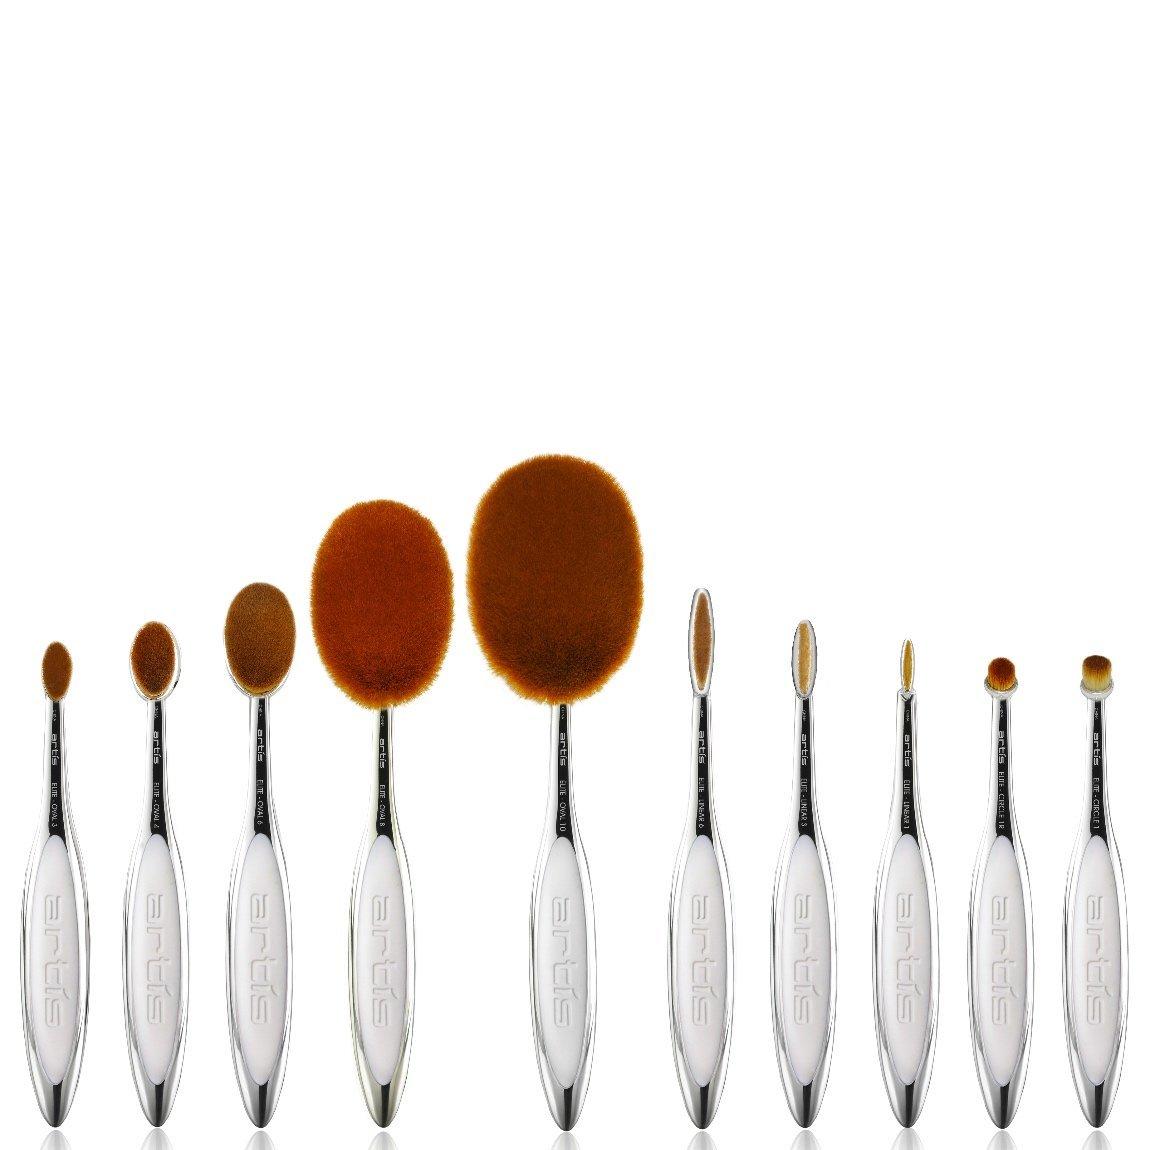 Artis Elite 10 Brush Set Mirror product swatch.